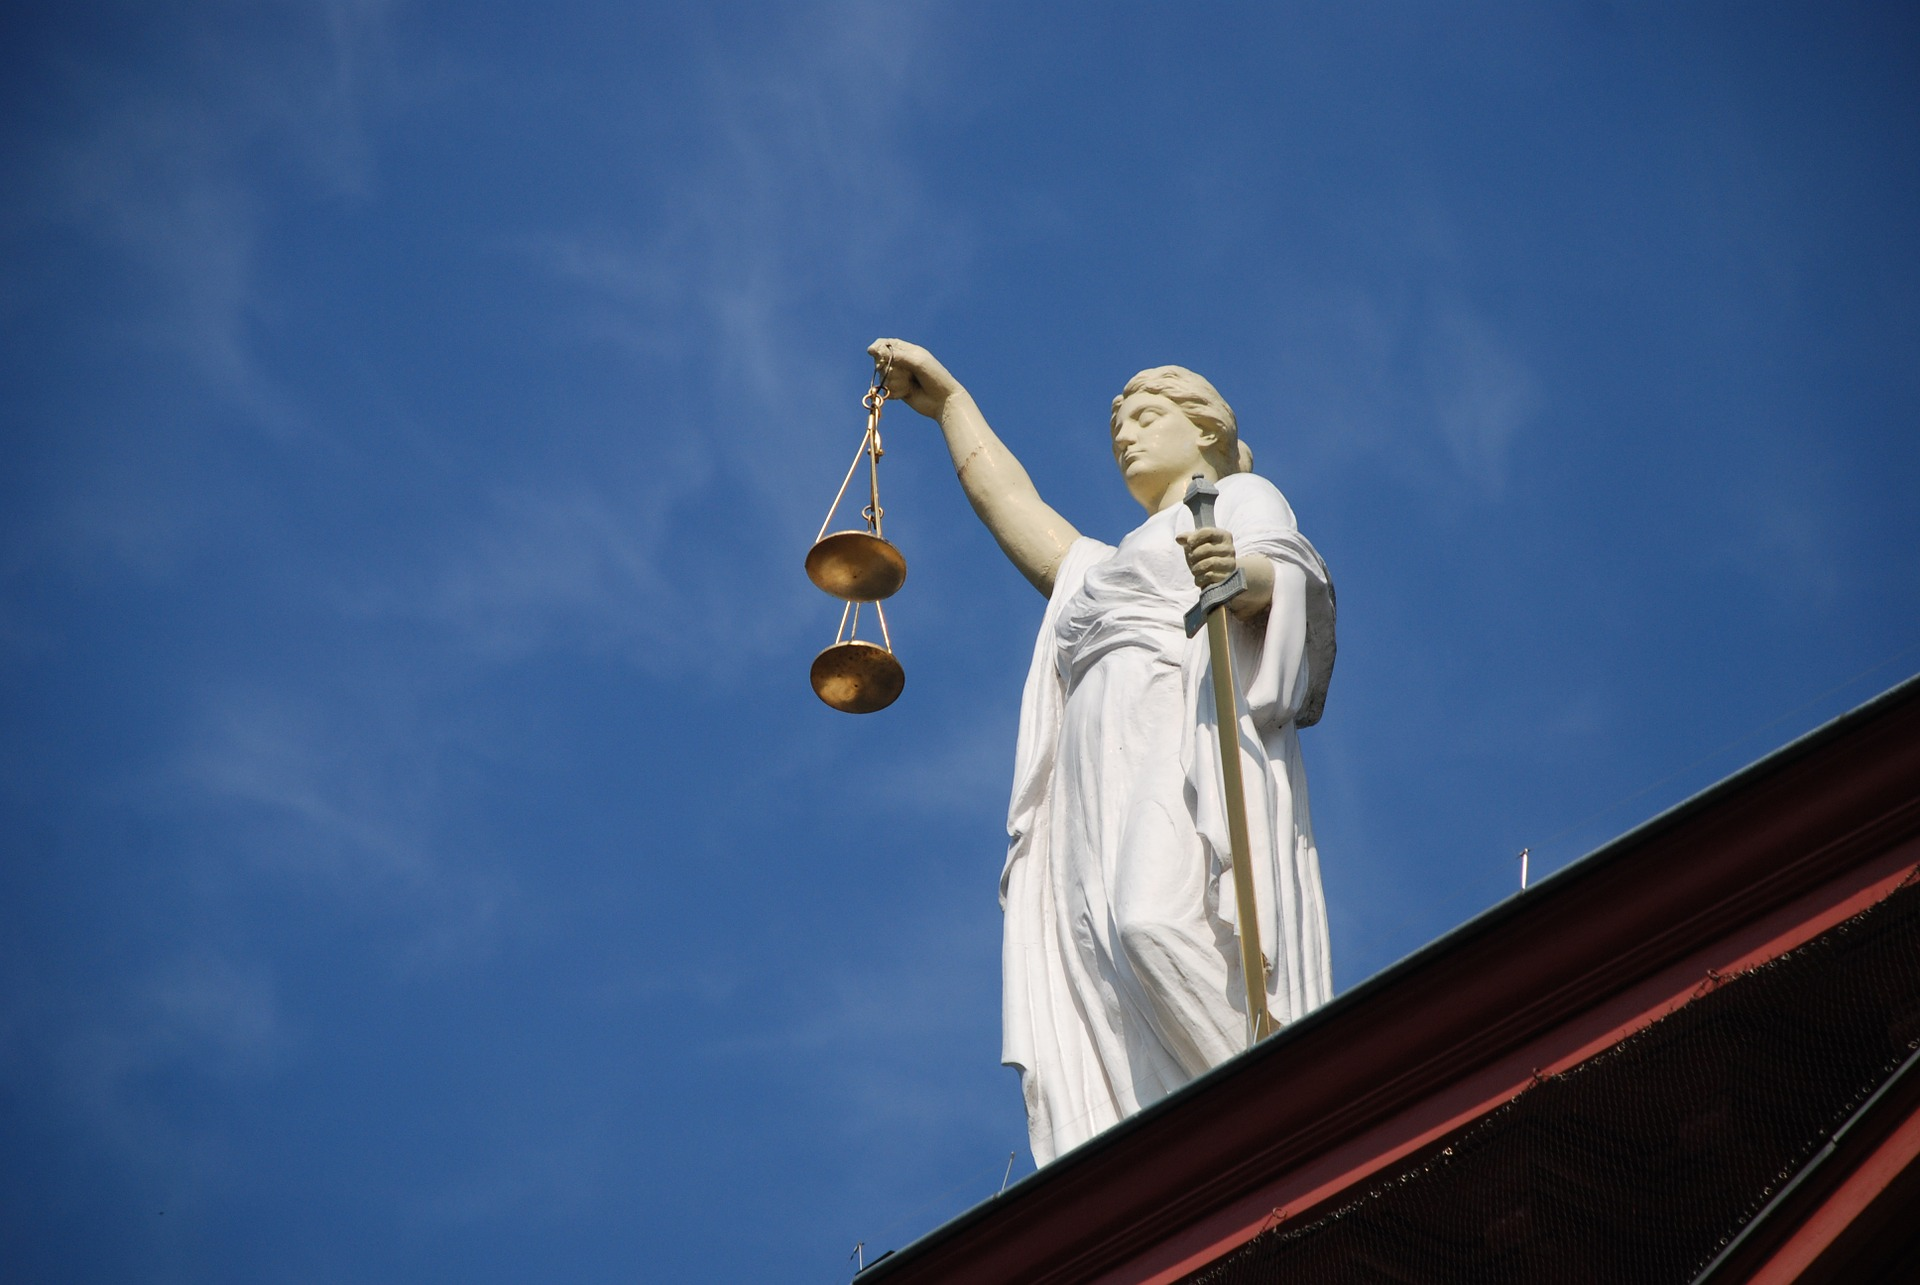 jurisdiction-677940_1920